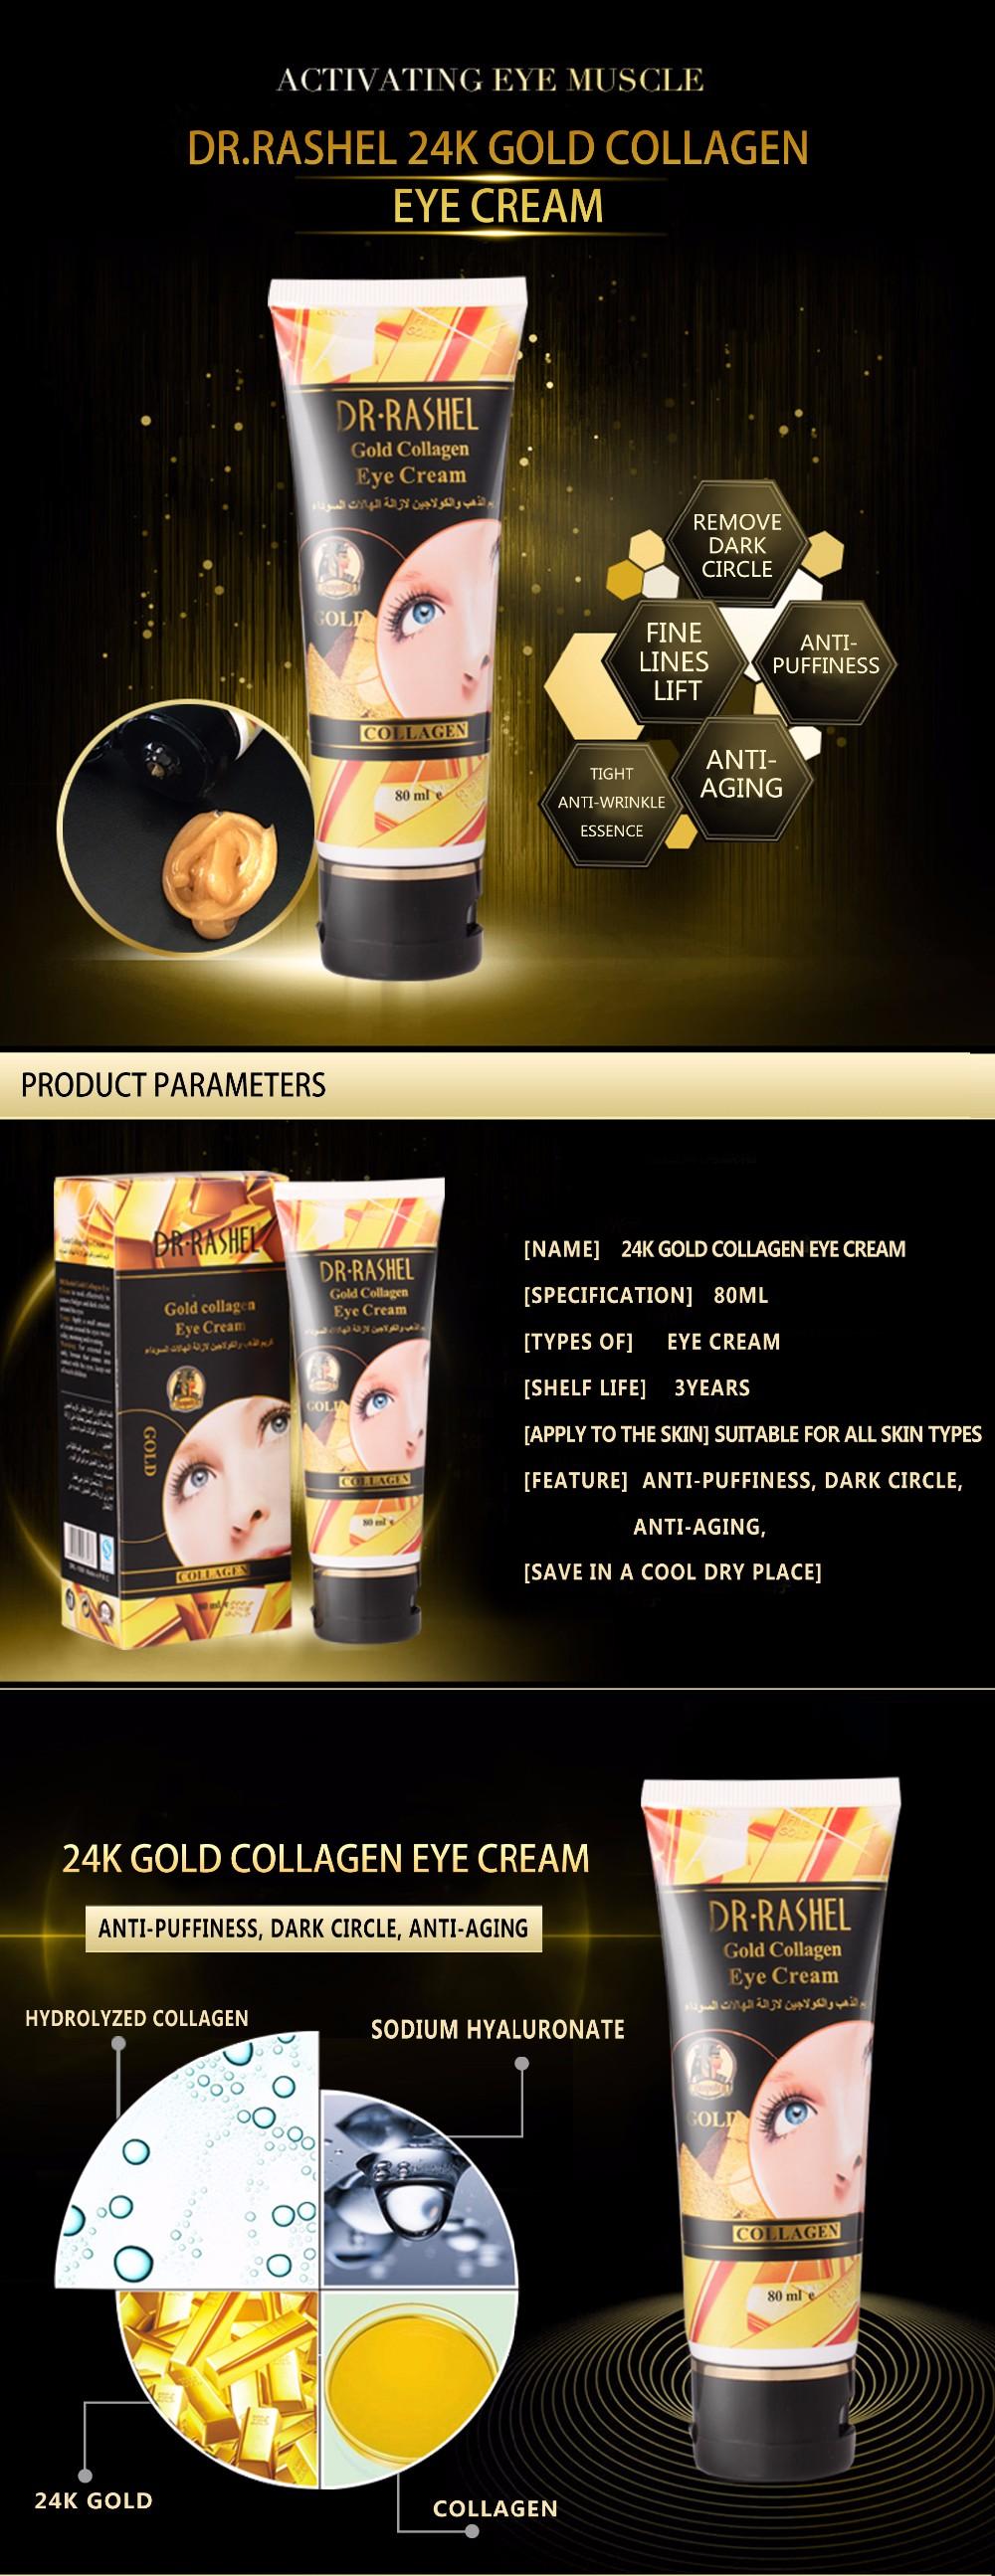 24K Gold Collagen Eye Cream Tight Anti-wrinkle Essence Fine Lines Lift Remove Dark Circle Anti-Puffiness Anti-Aging ageless 2